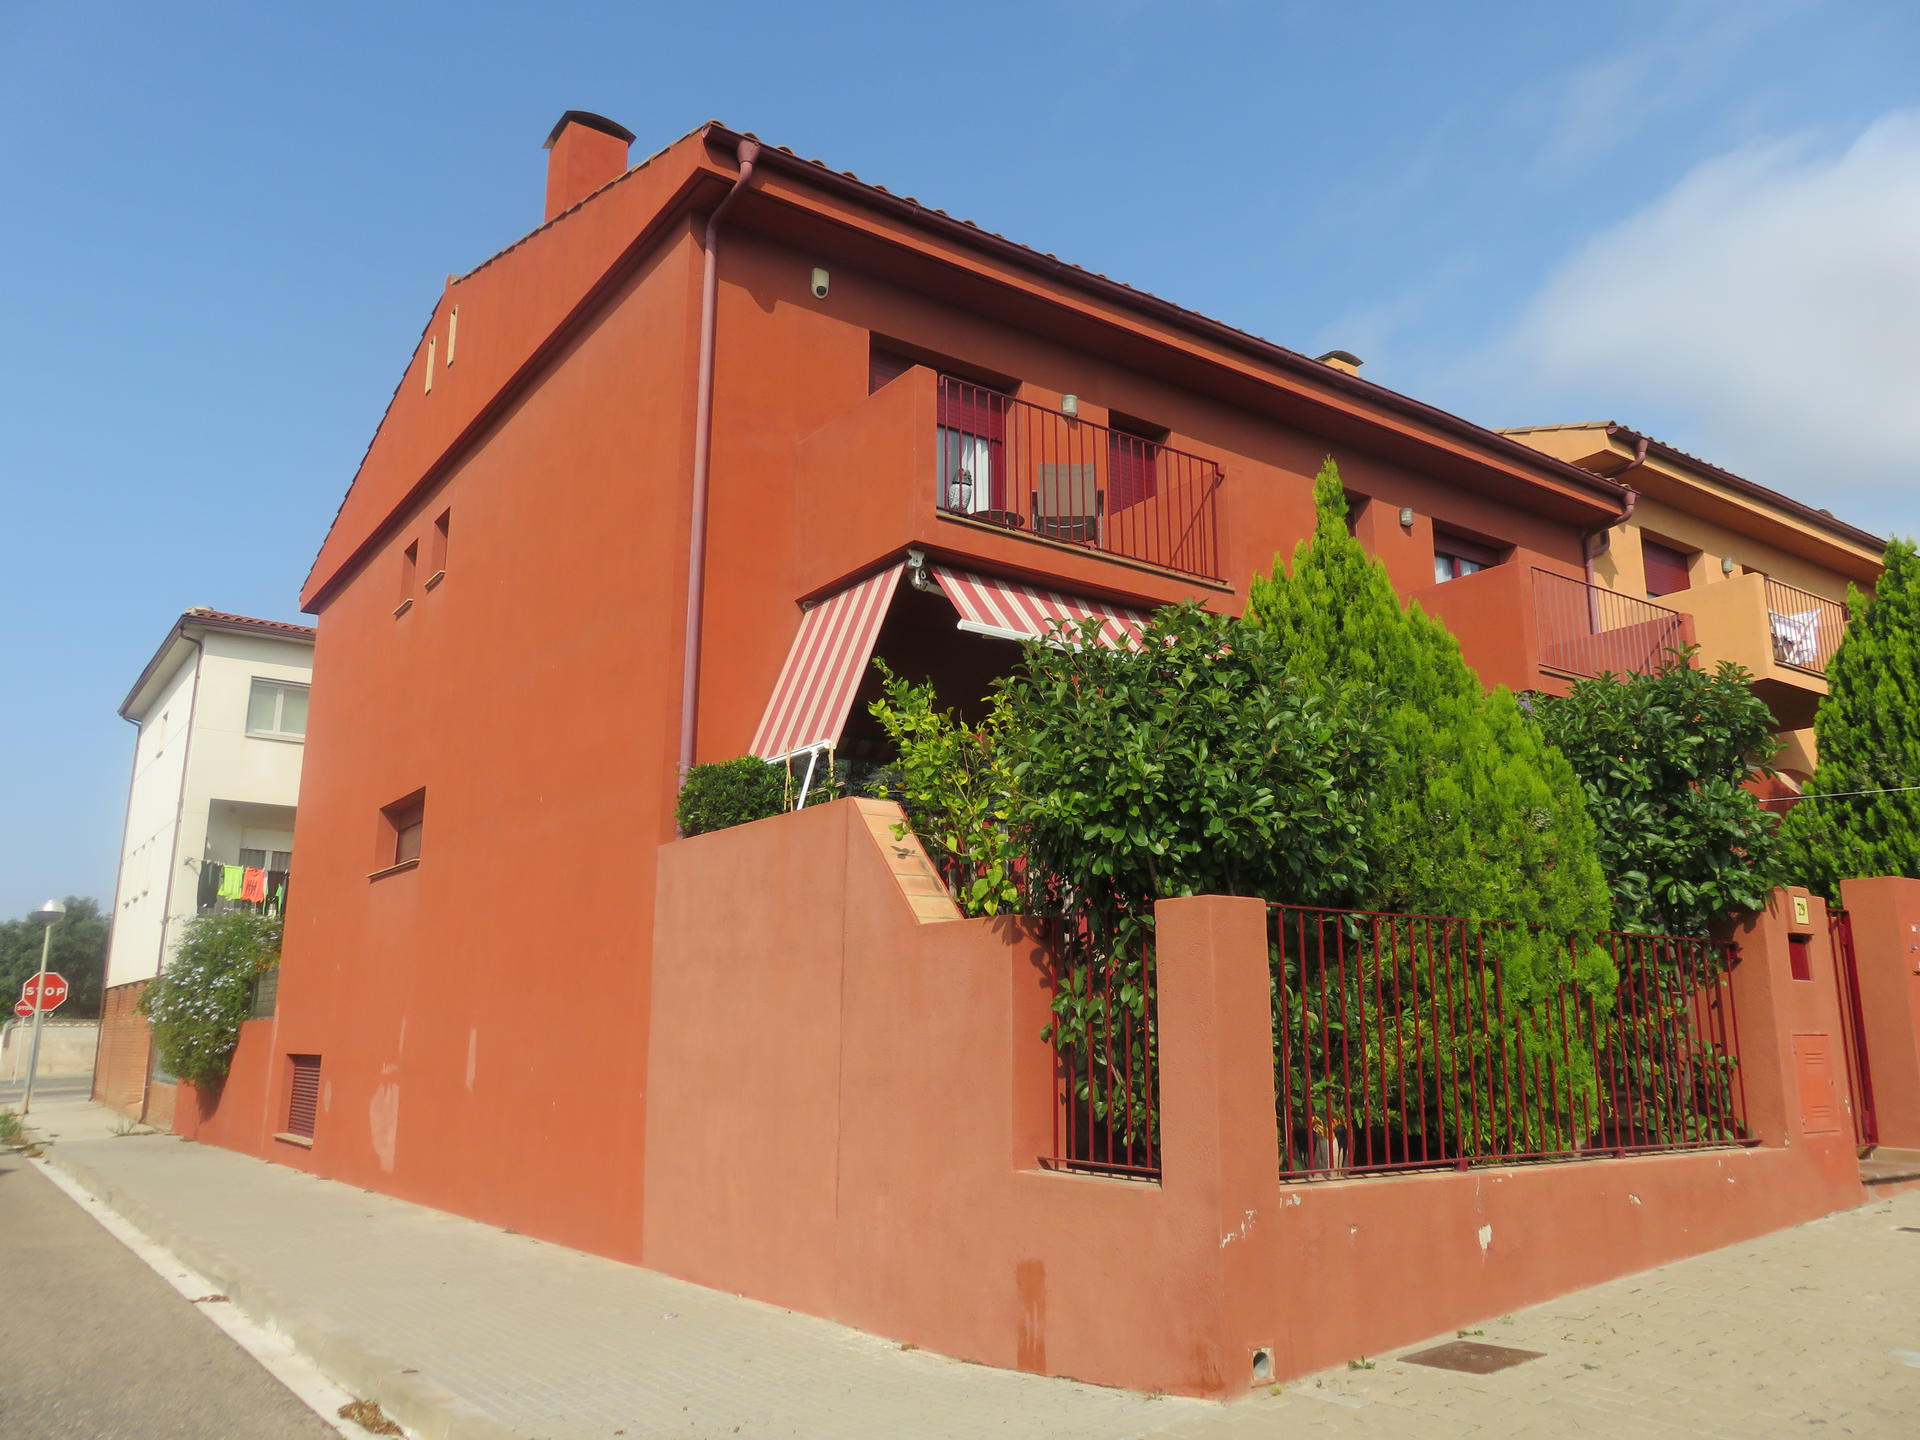 Huis -                               Torroella De Montgrí -                               4 slaapkamers -                               0 personen